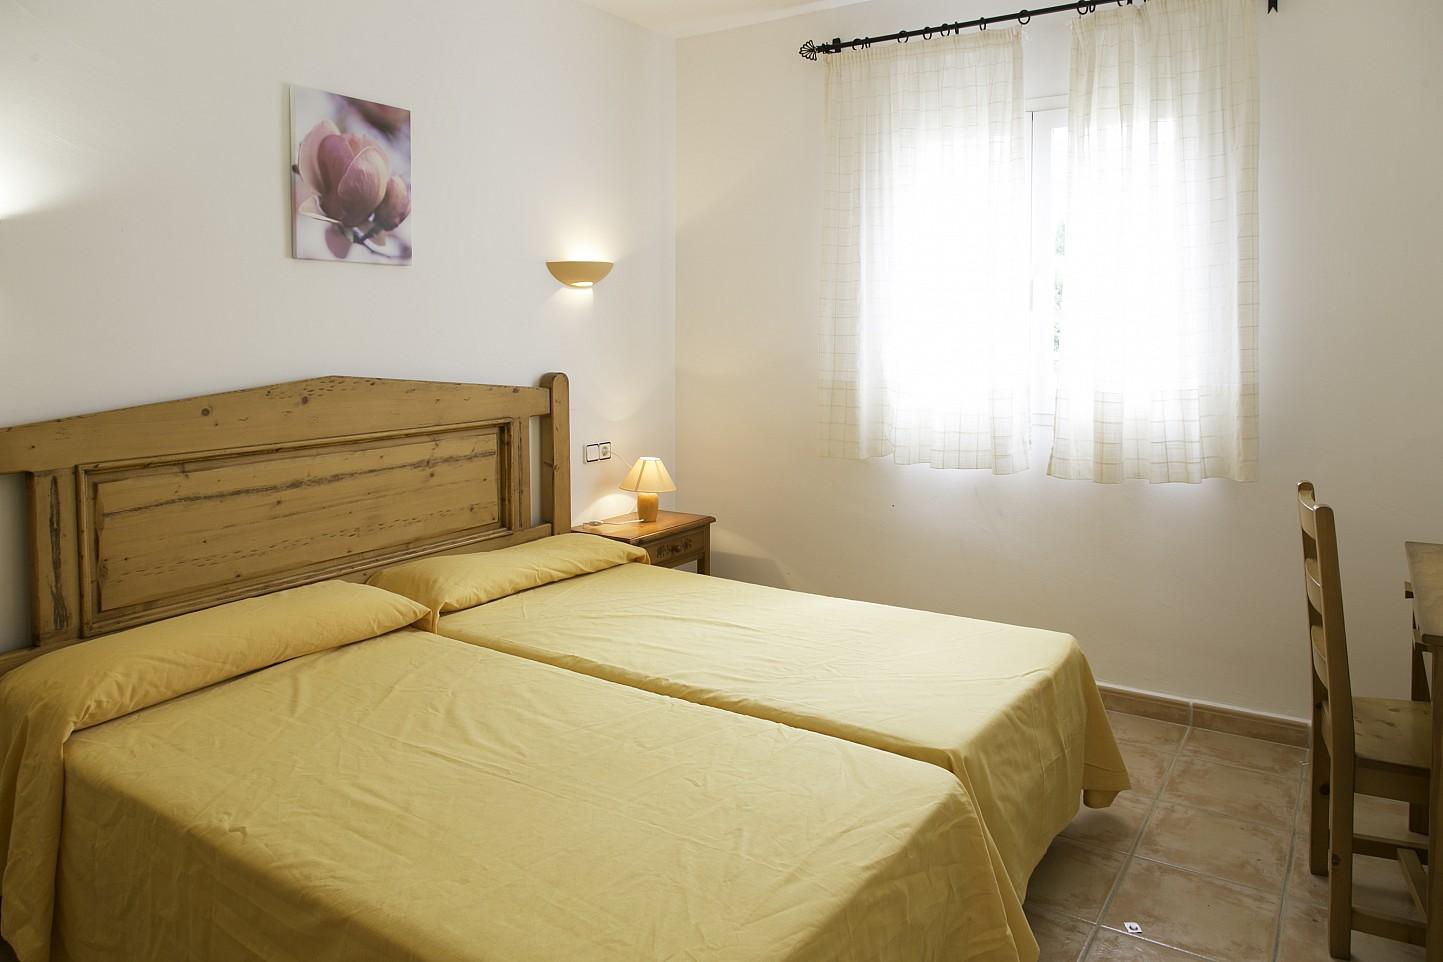 Dormitorio con dos camas de bonita casa en venta en Urb. Villas de Cala Romántica en Mallorca